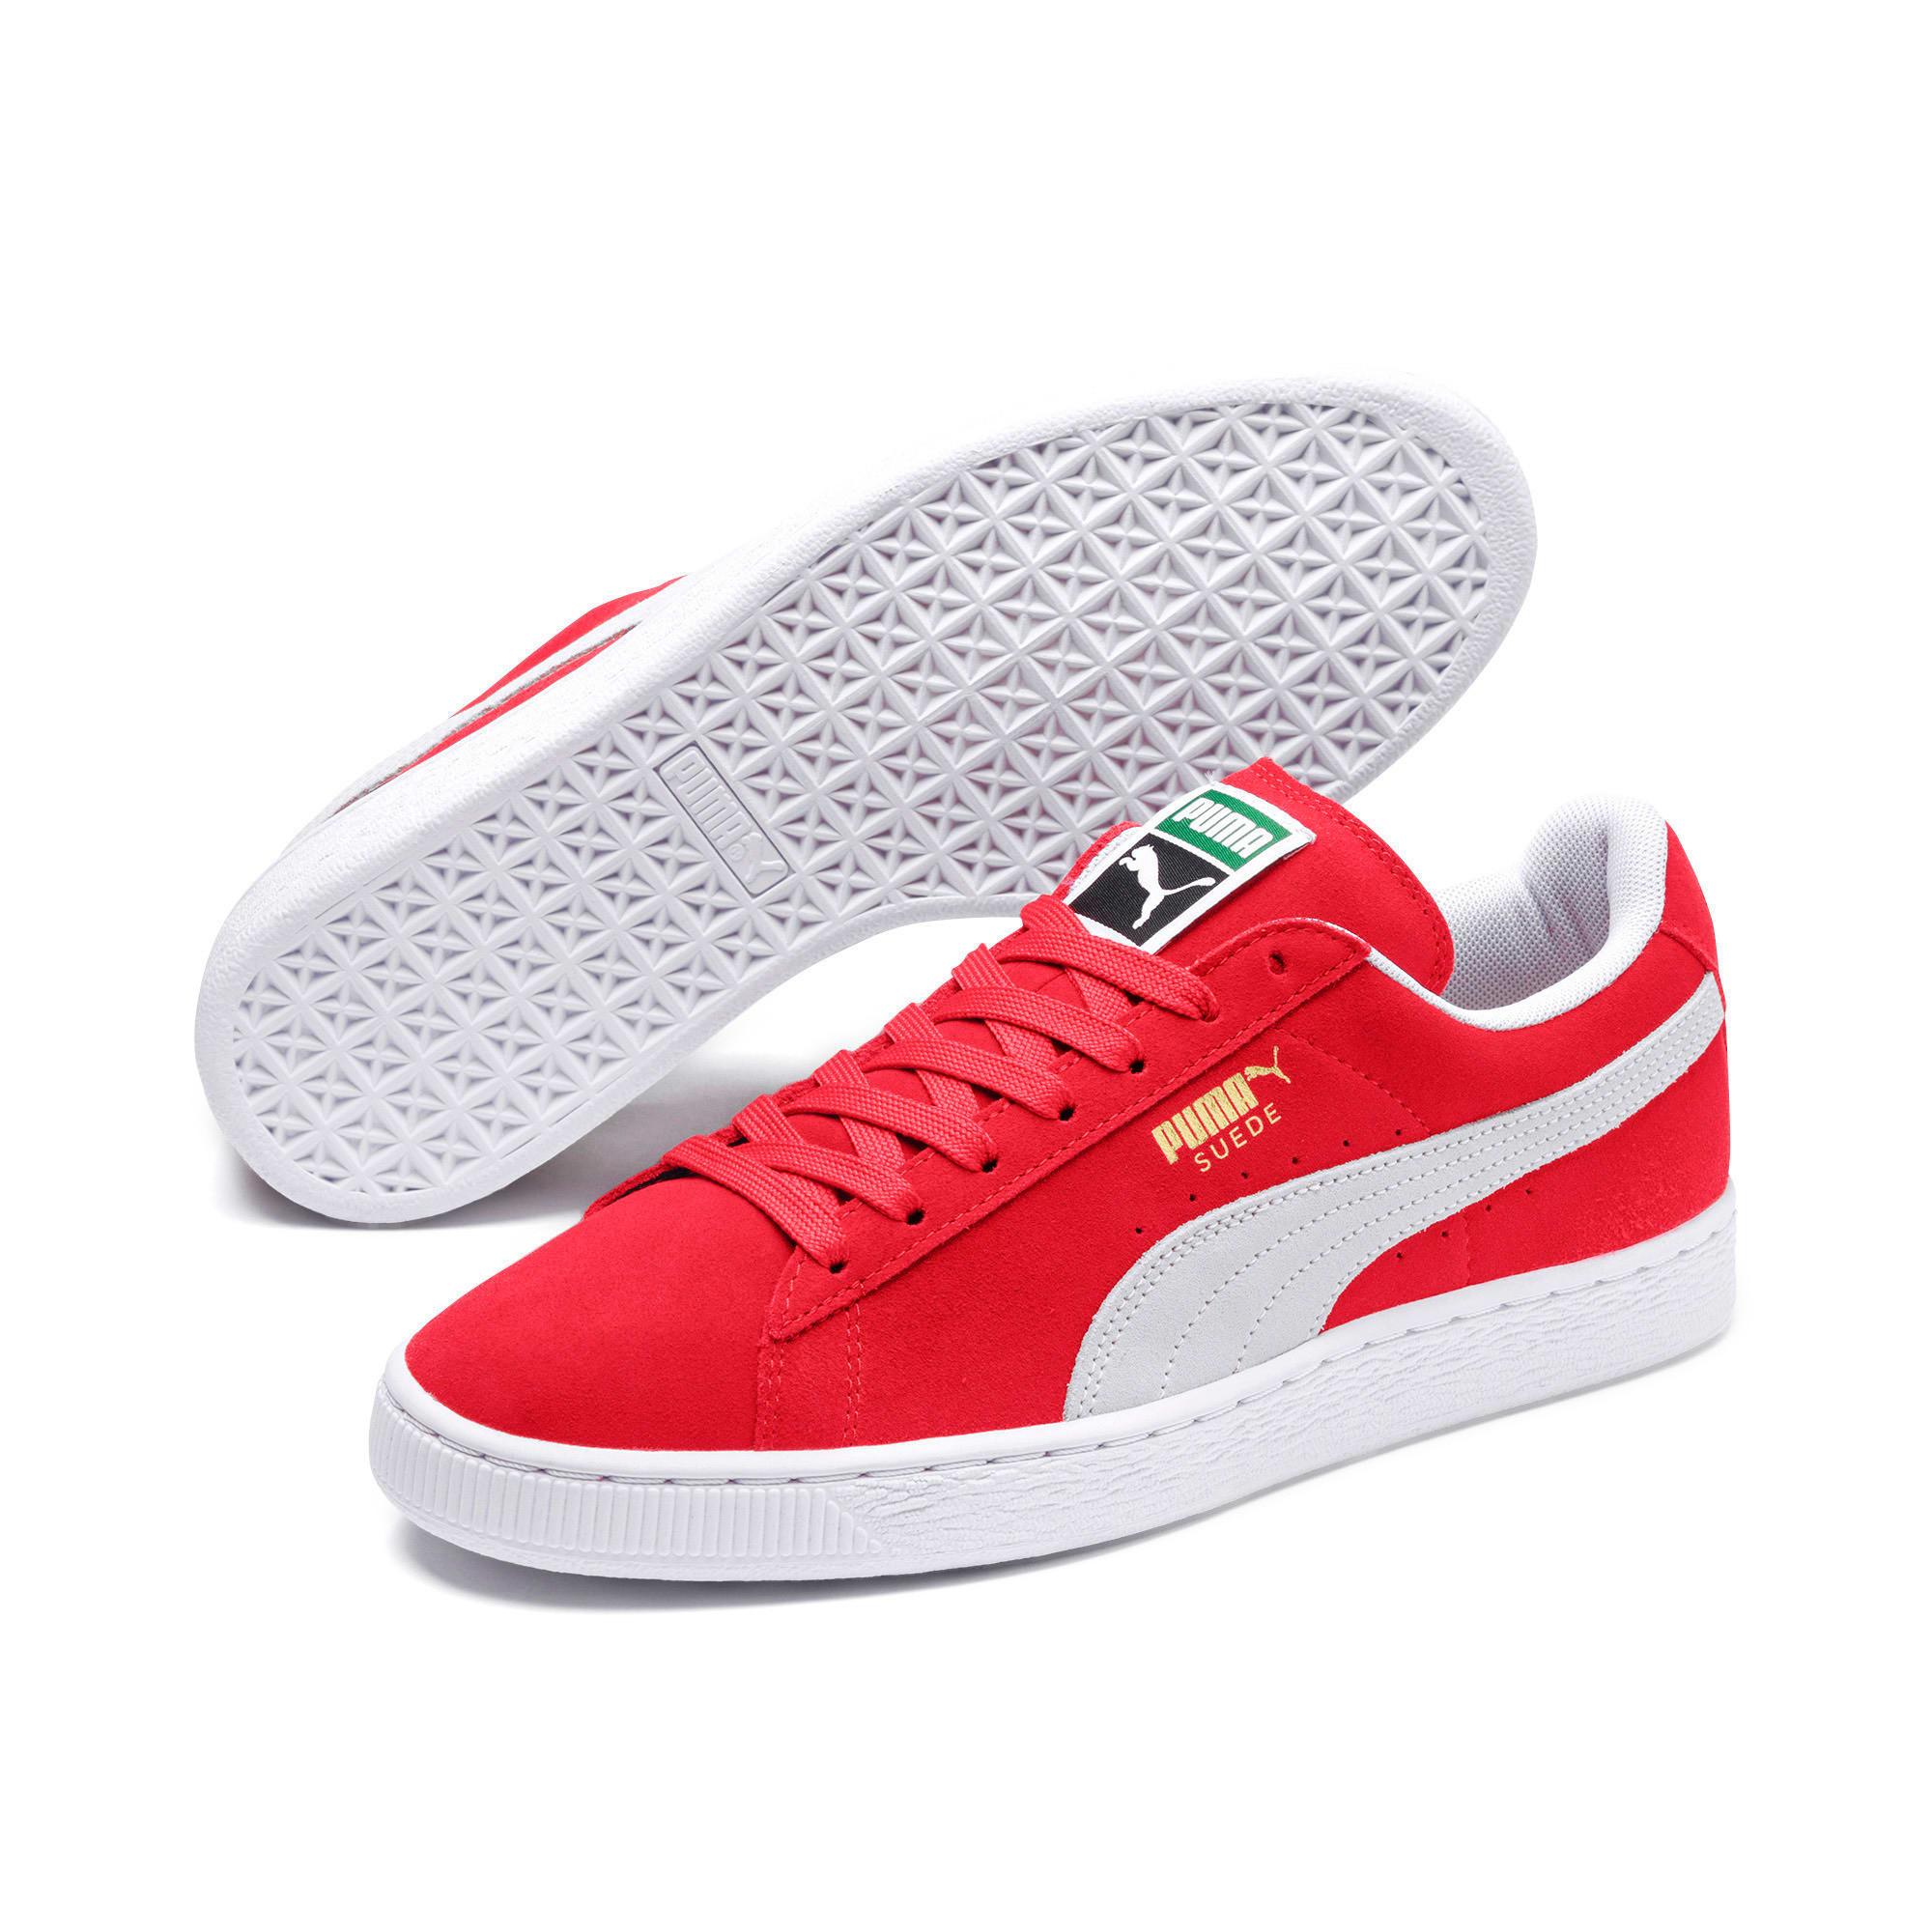 Miniatura 2 de Zapatos deportivos clásicos de gamuza, team regal red-white, mediano